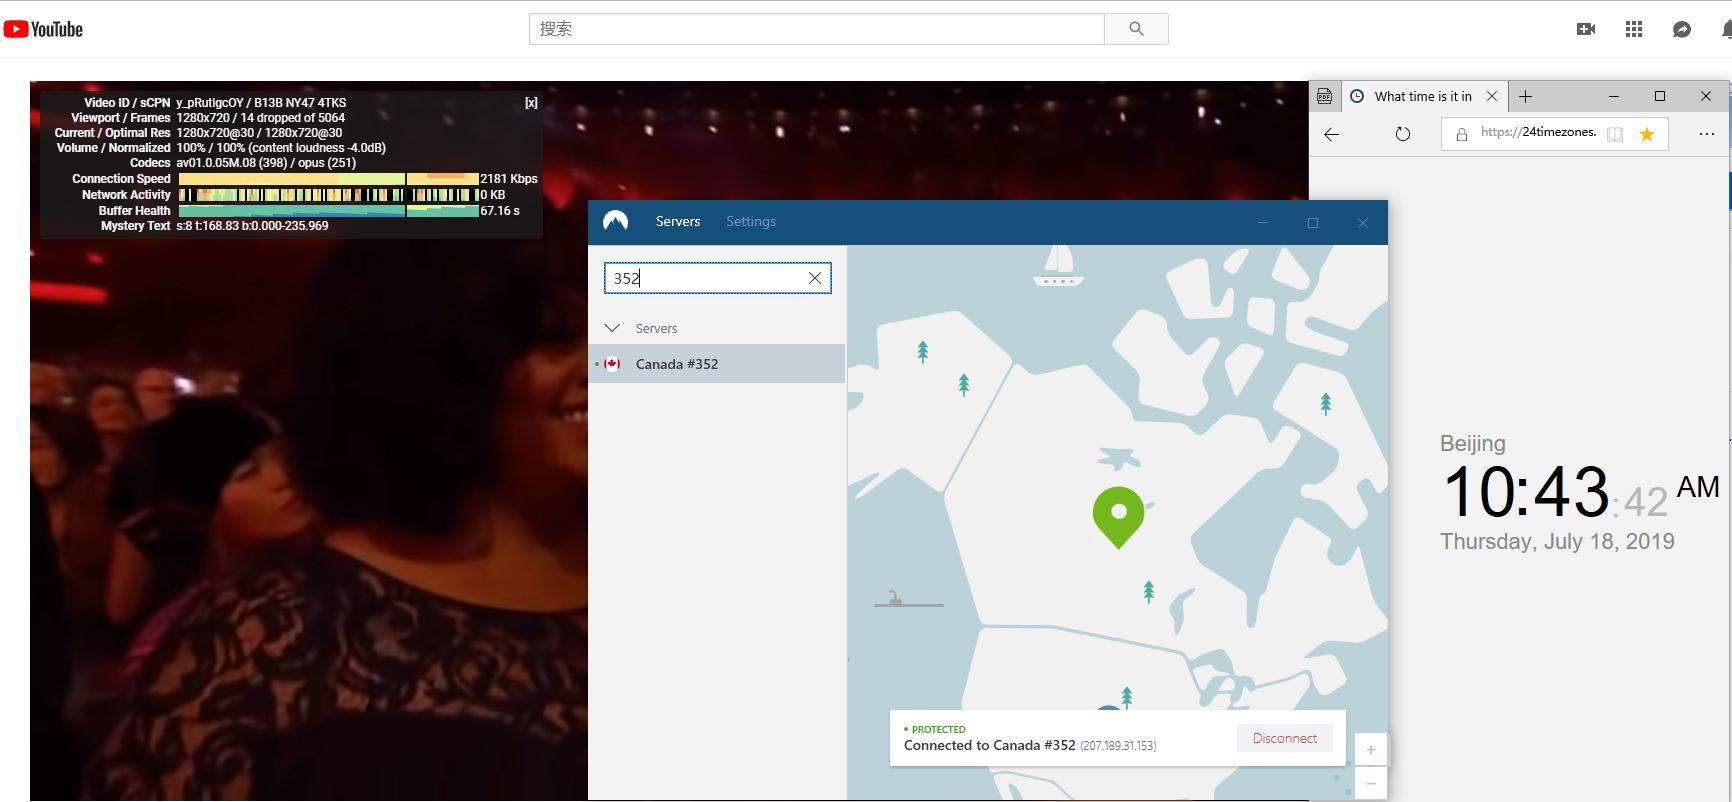 NordVPN Windows 翻墙 科学上午 加拿大-352服务器 YouTube速度测试-20190718